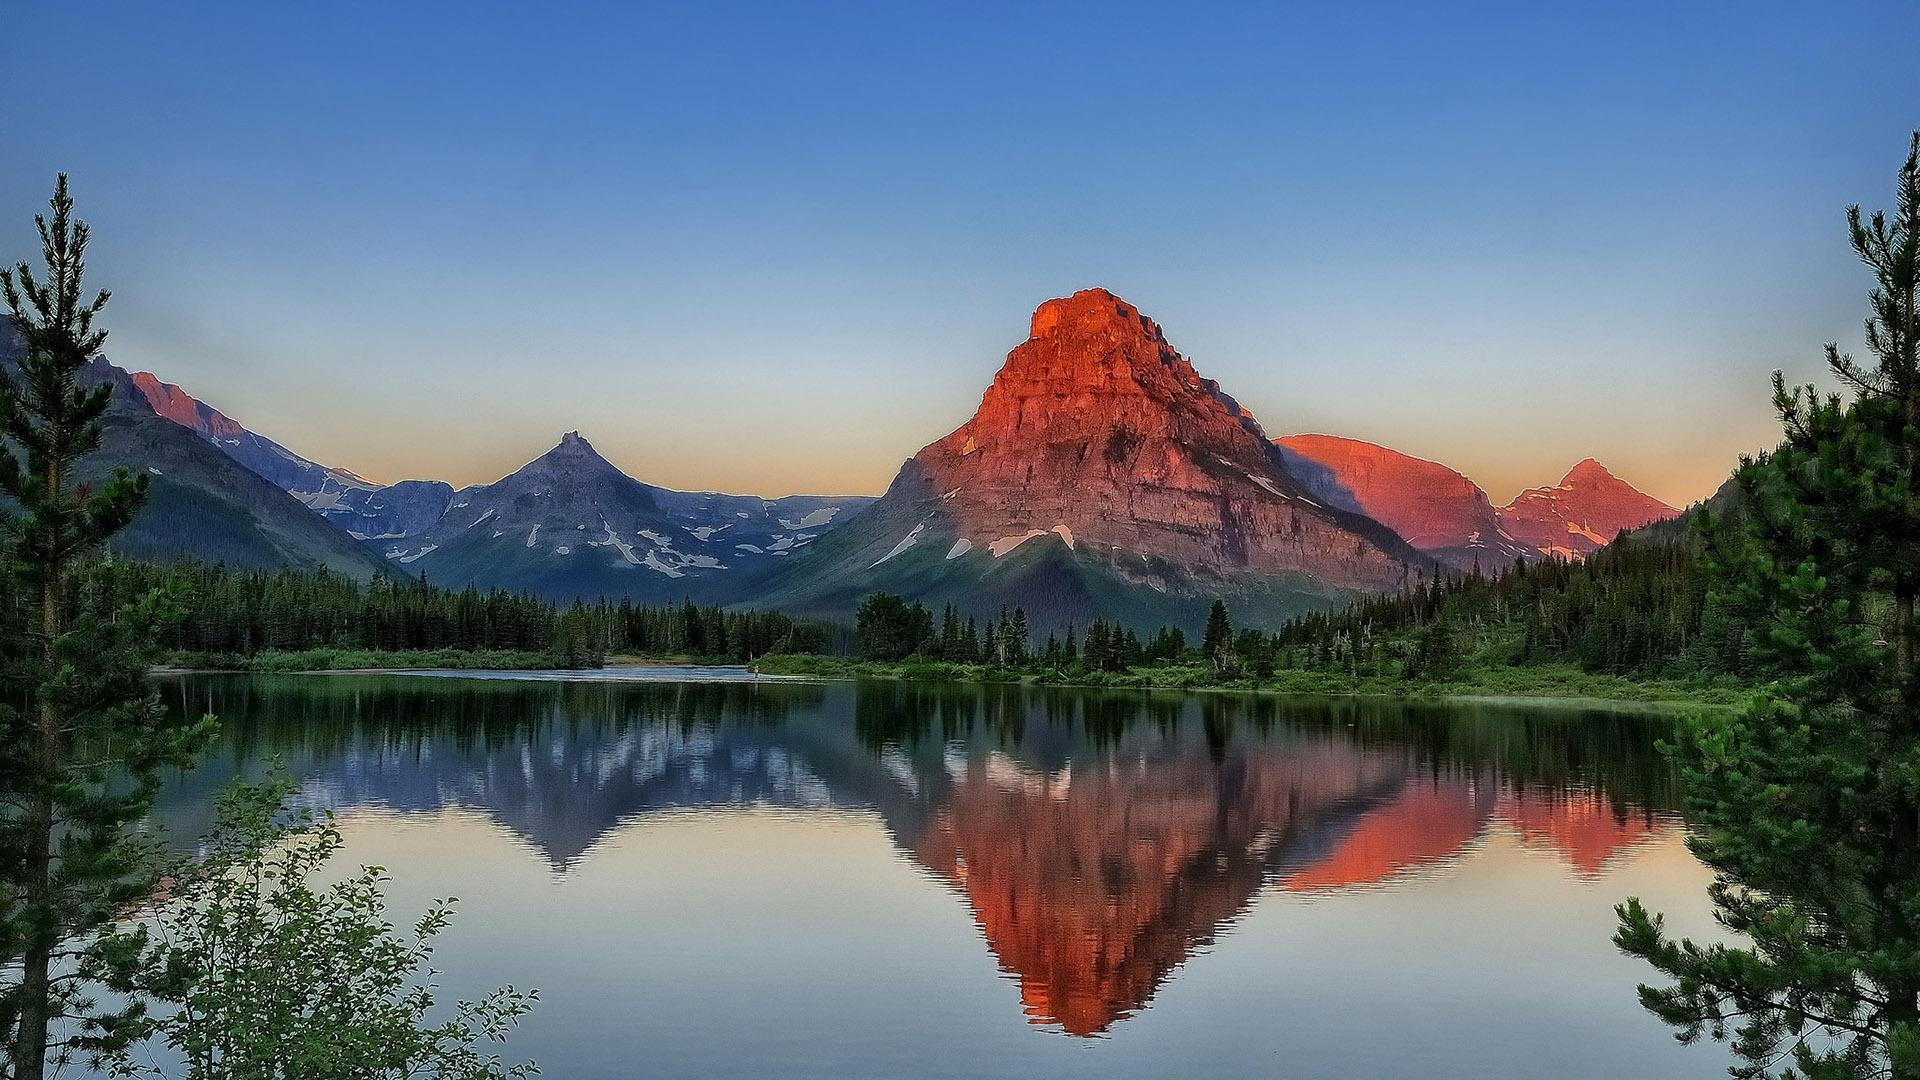 Cute Baby Love Hd Wallpaper Download Hd Copper Mountain Reflection In The Lake Wallpaper